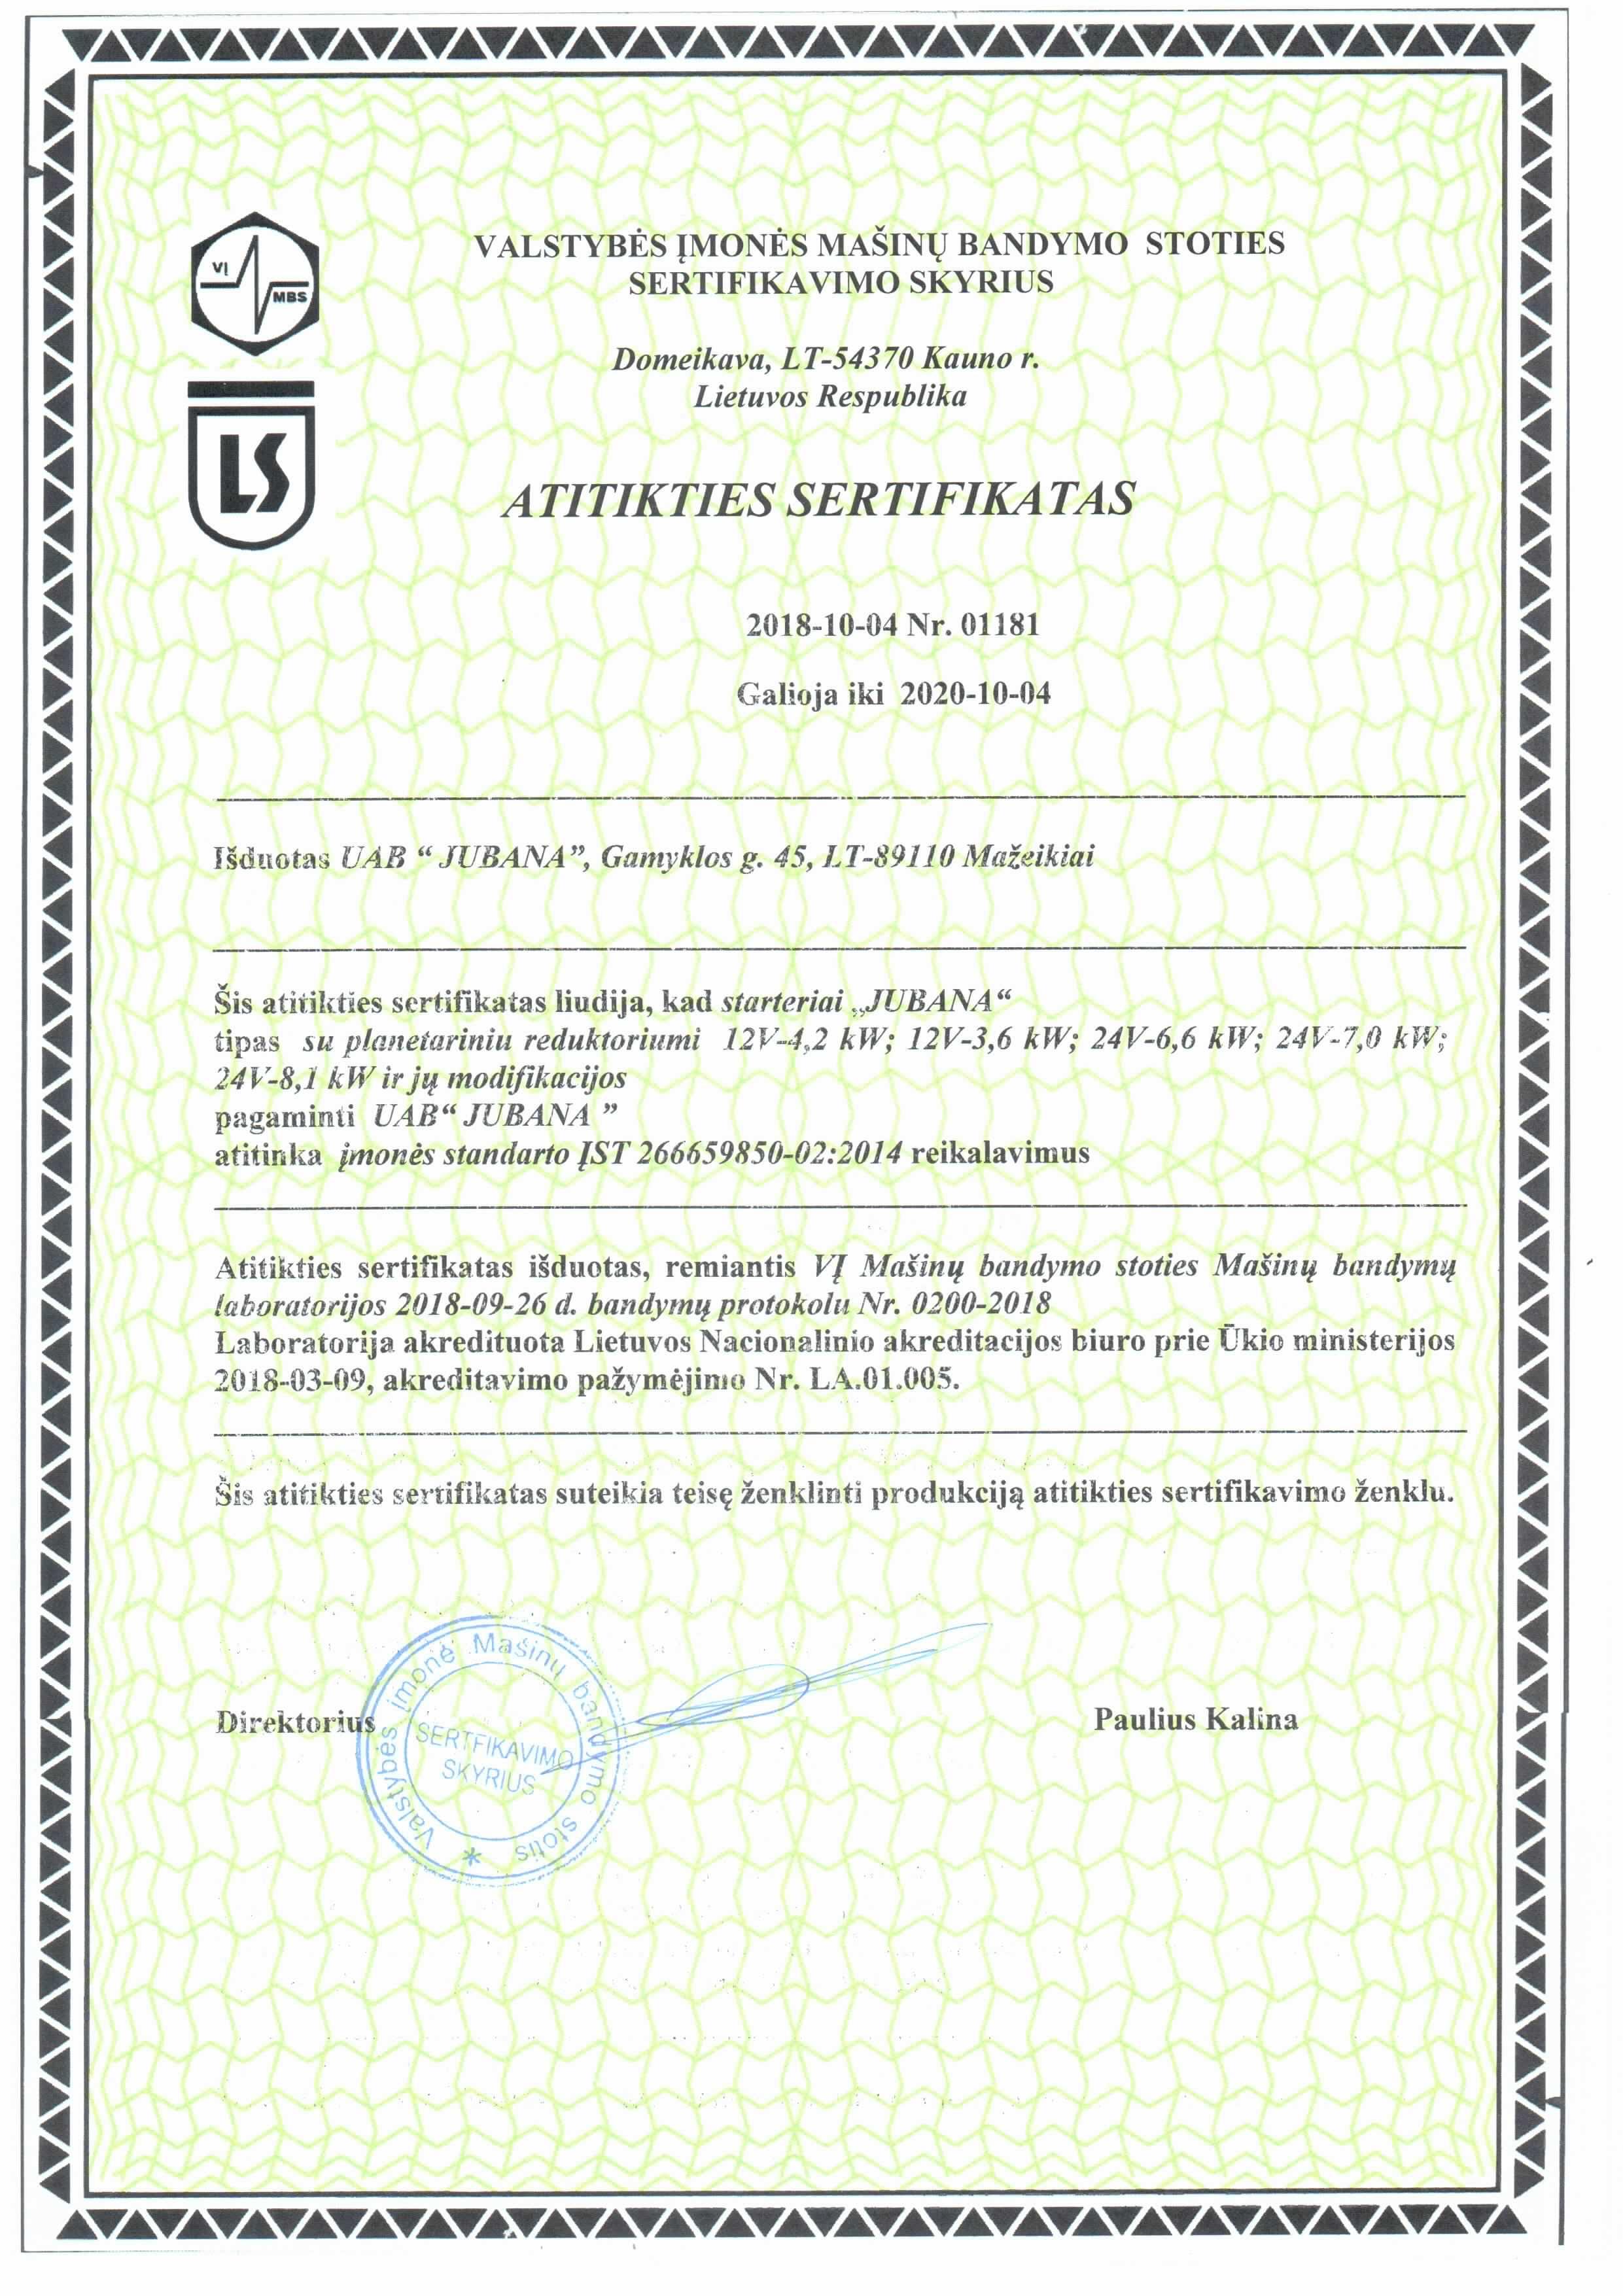 starteris sertifikatas jubana plan-lt